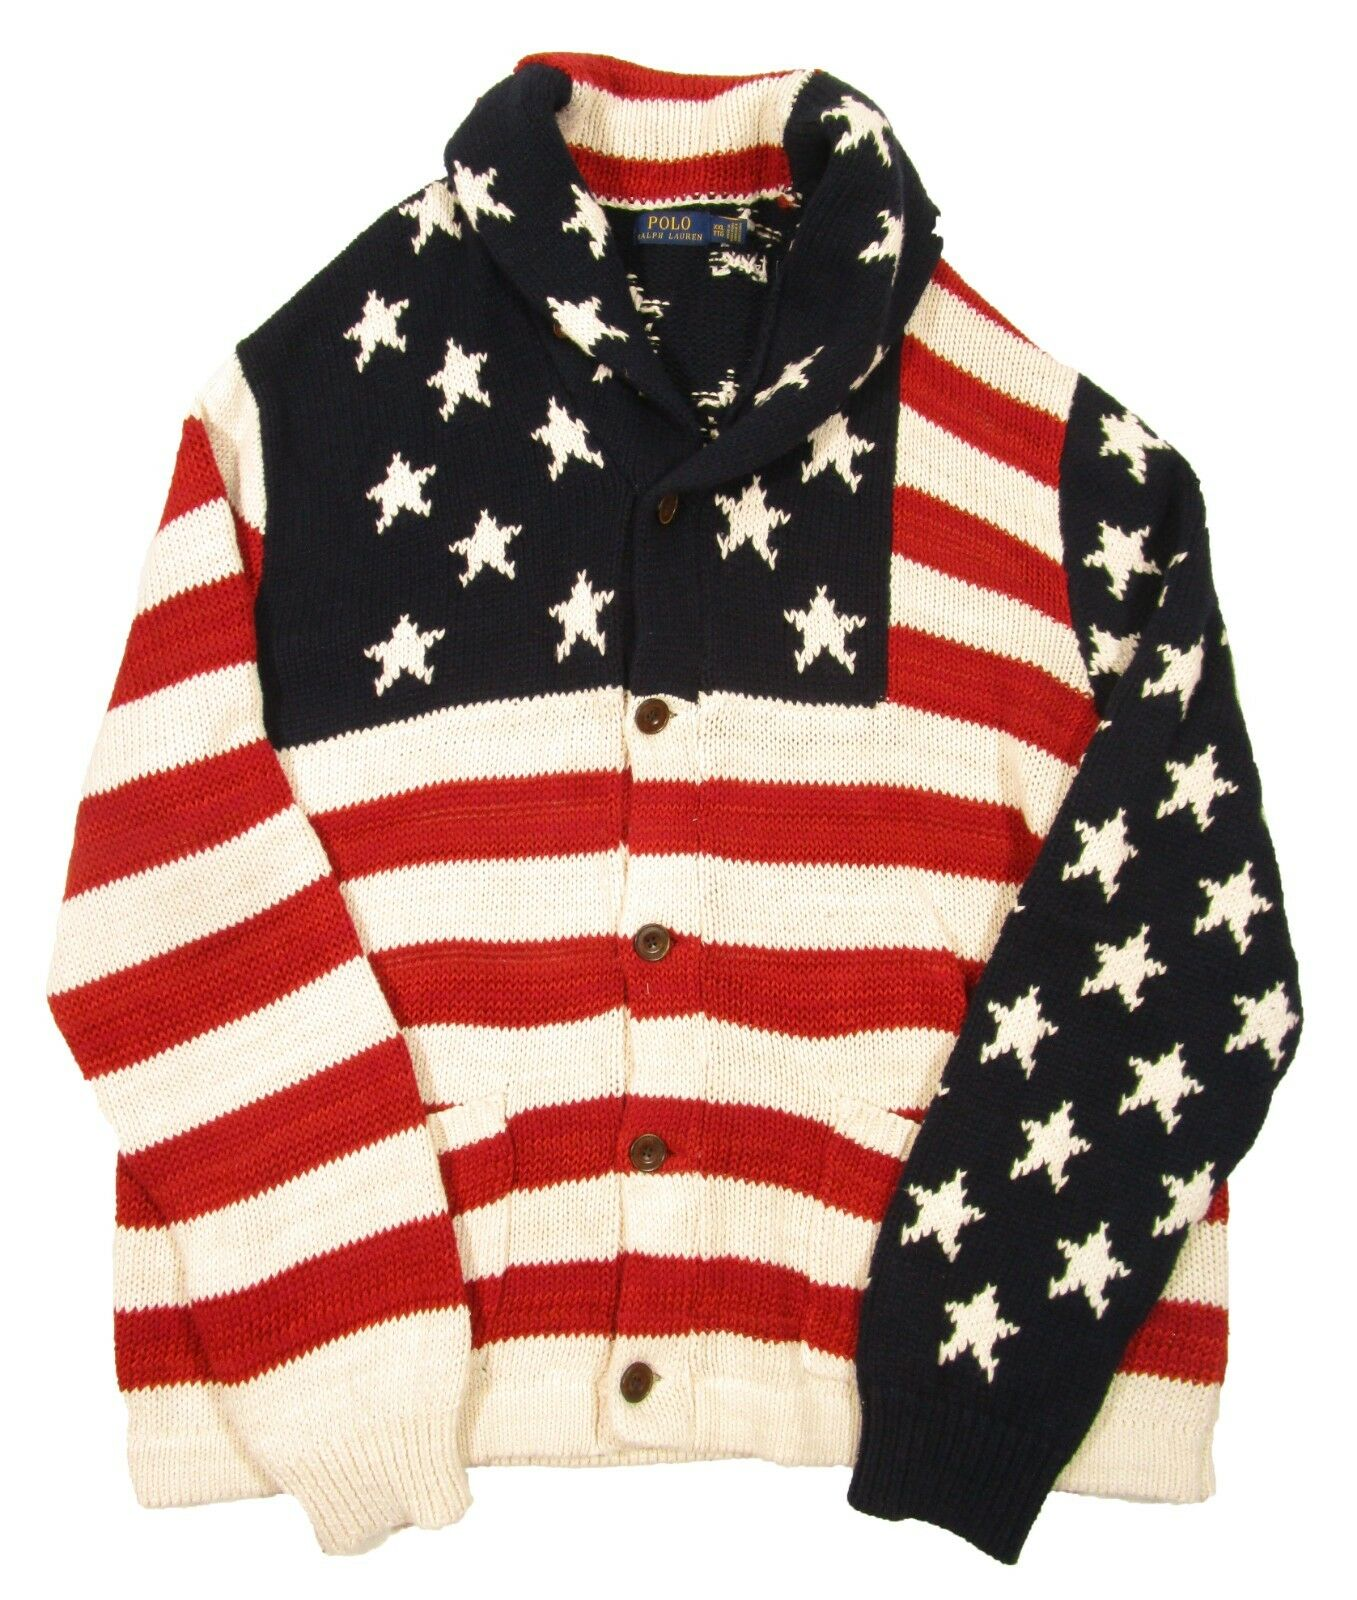 Polo Ralph Lauren Men's Flag Multi American Cotton Blend Shawl Cardigan Sweater